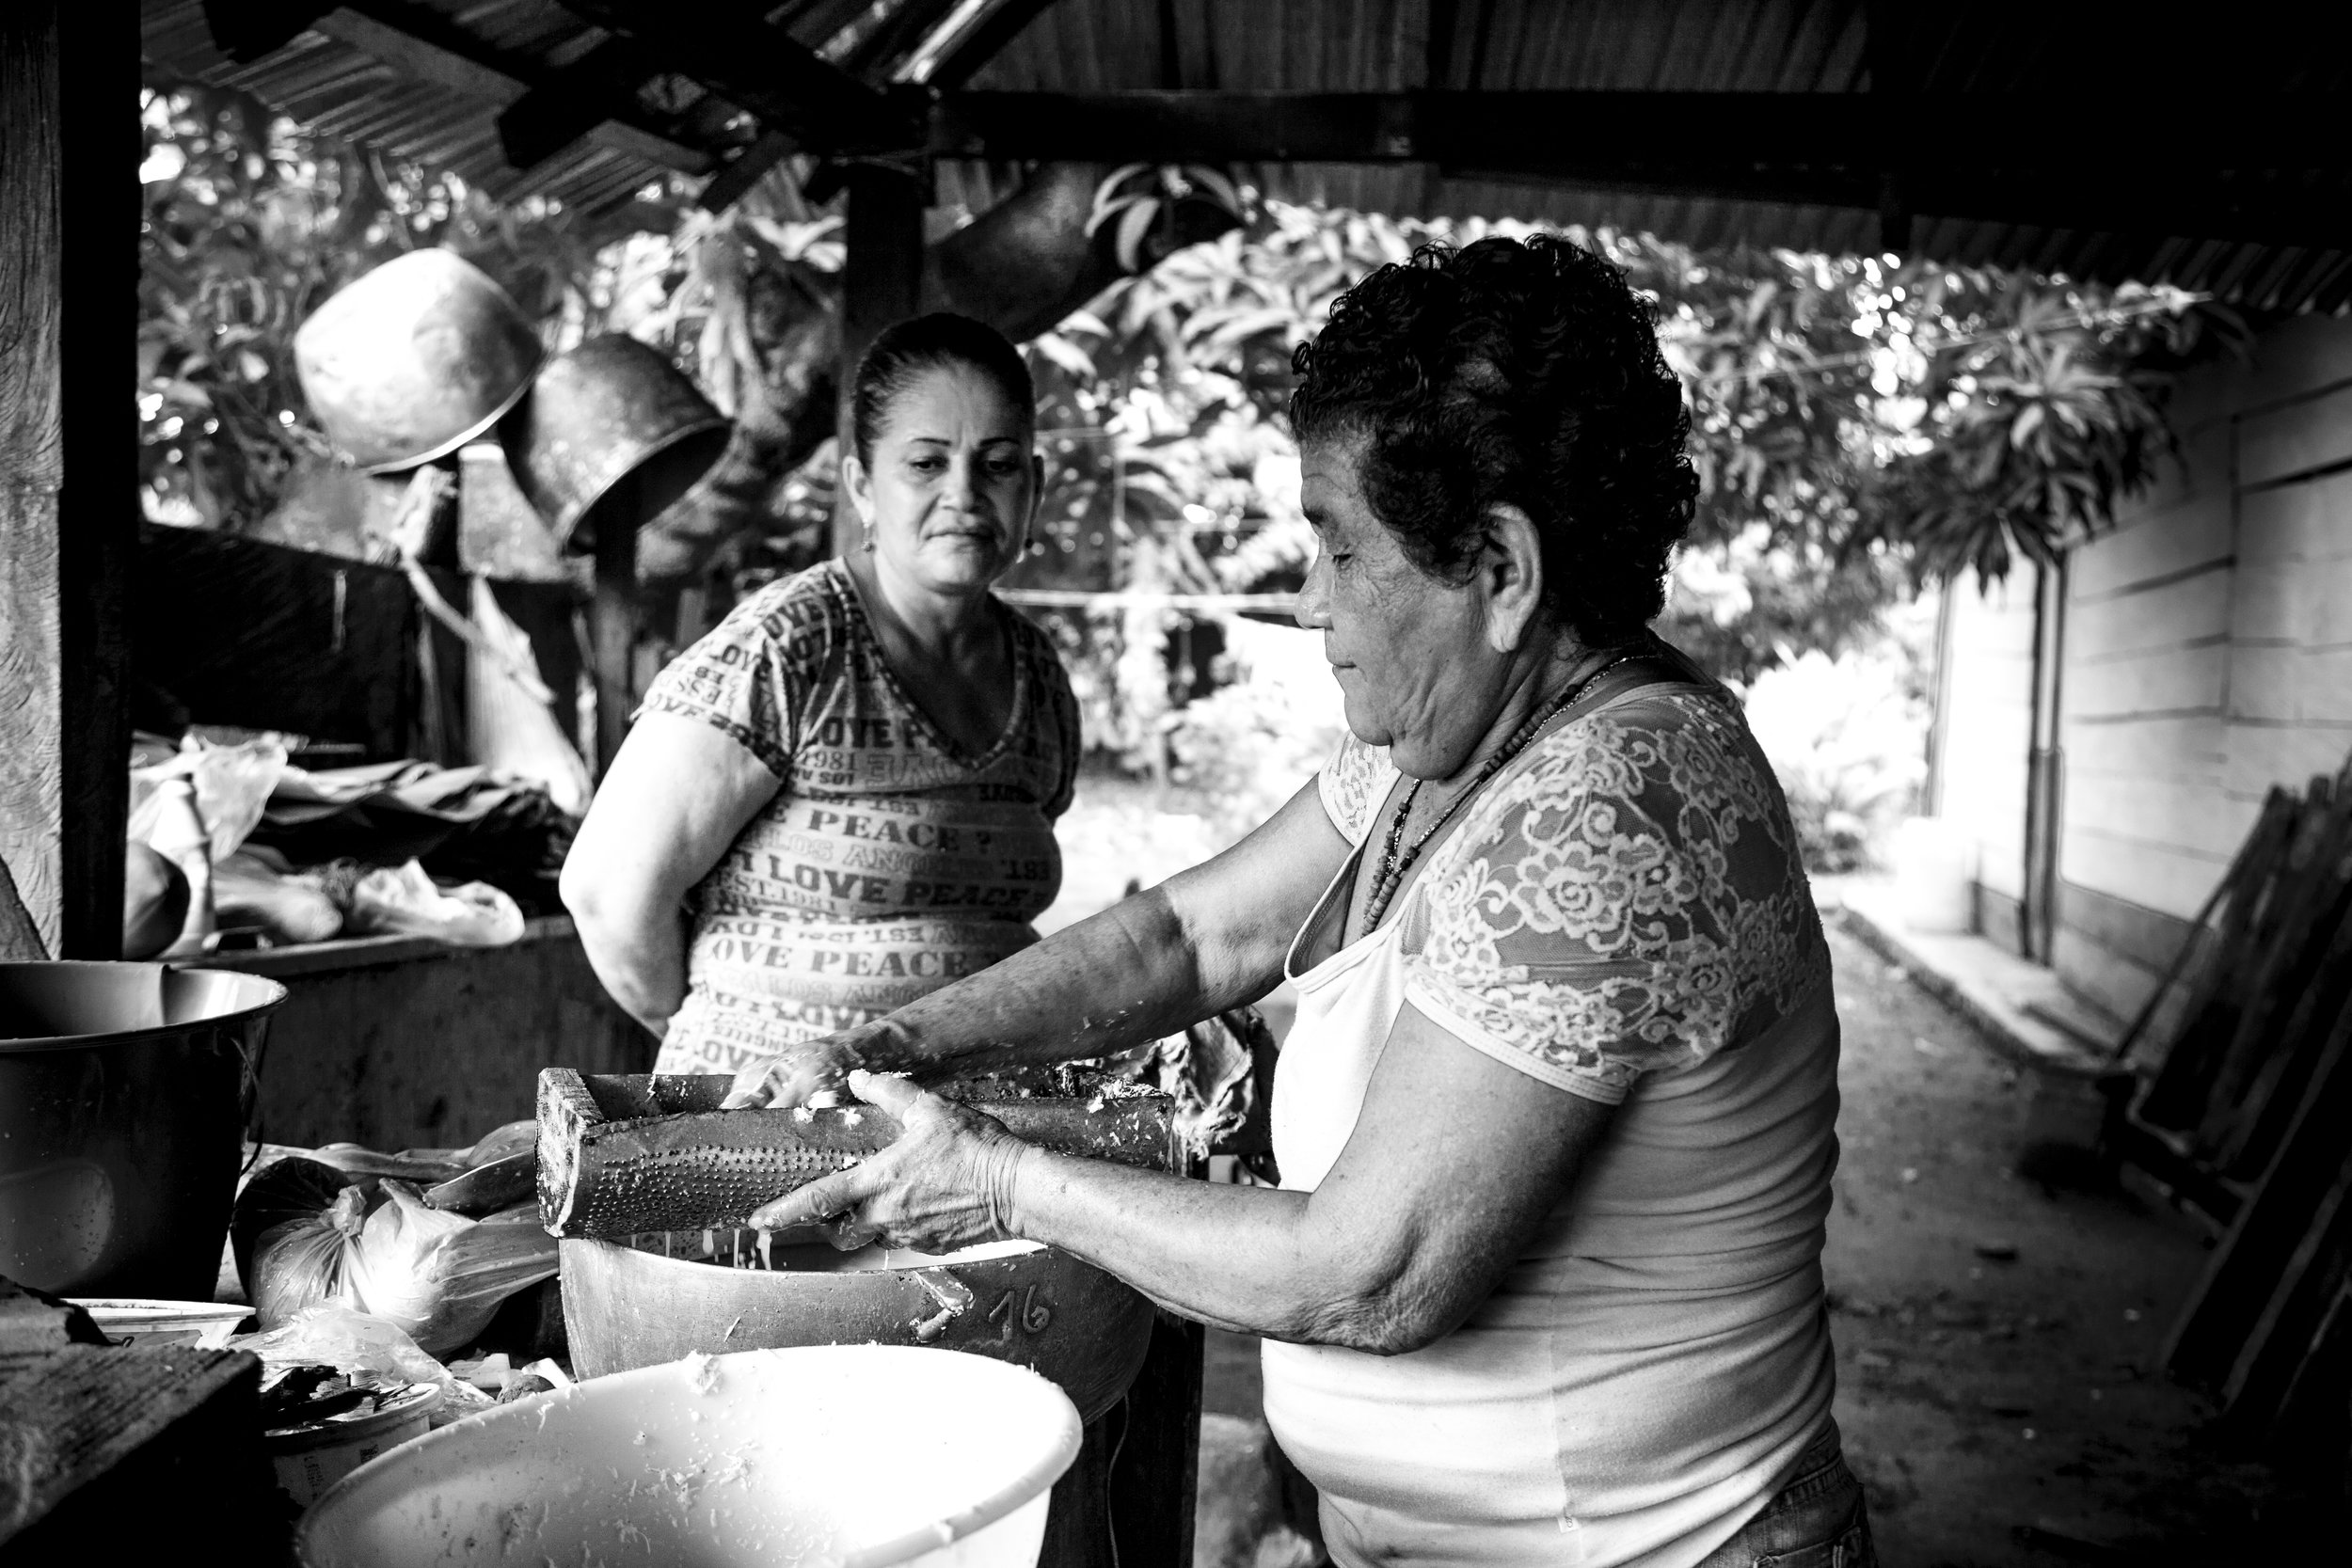 Liliana Merizalde Land in peace Apartadó 30 doña Edita cocinando bn.jpg